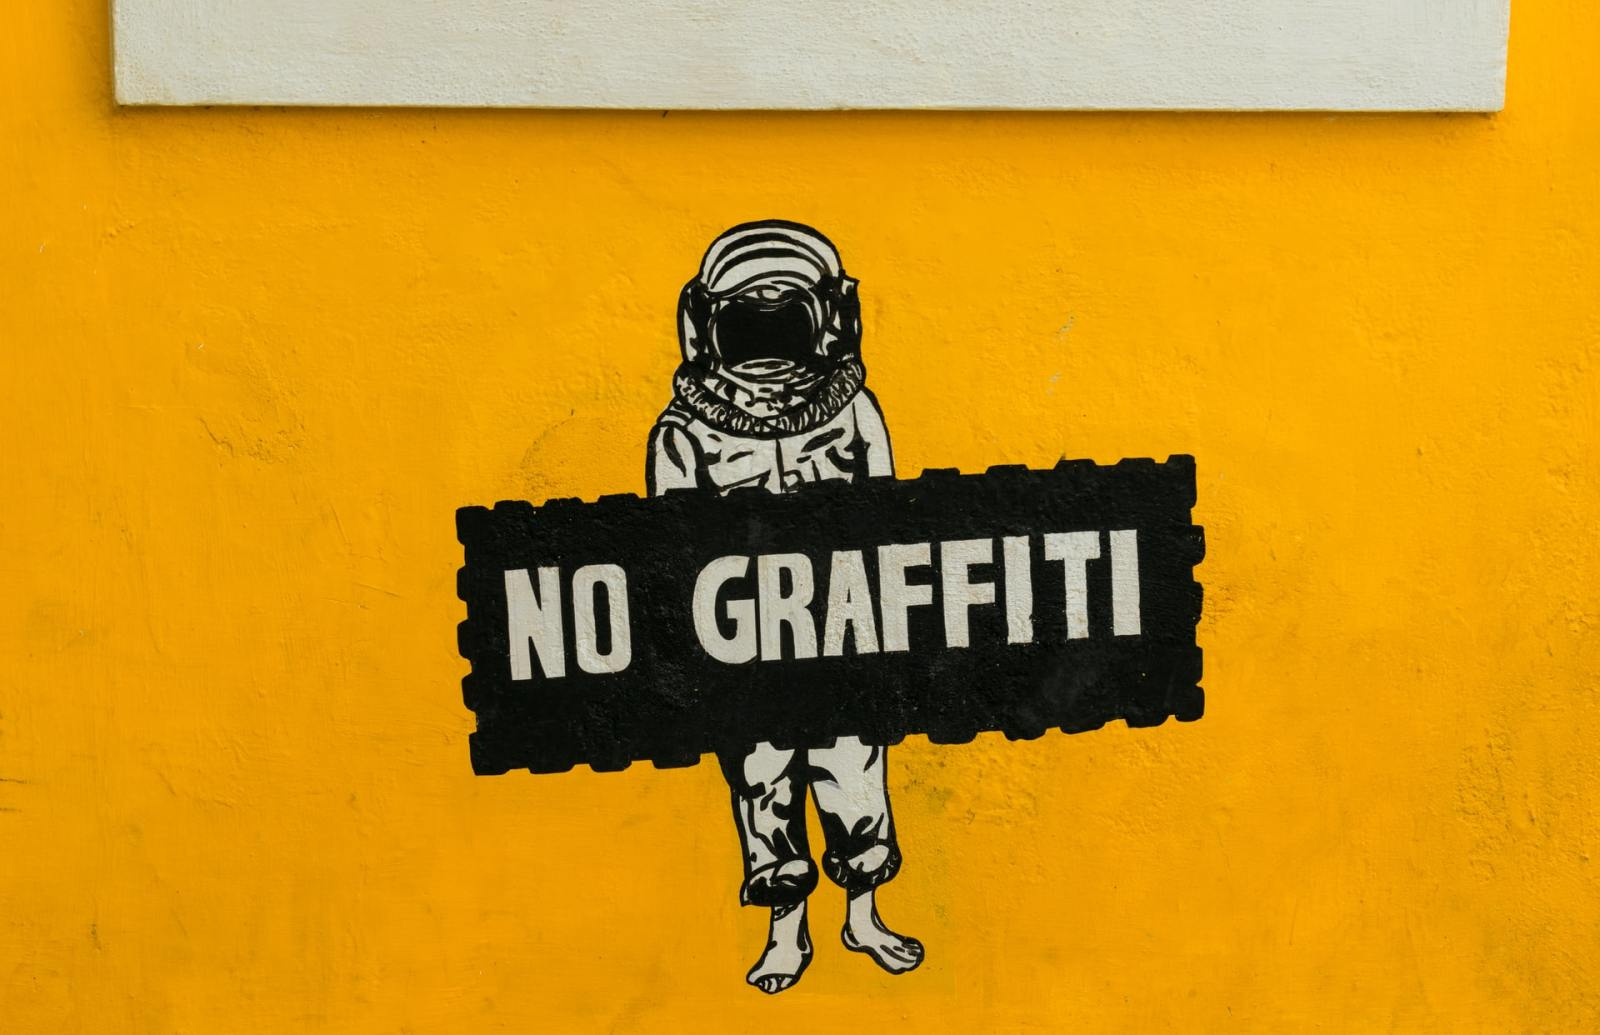 Jill Lepore beschreibt keine Graffitis. (Foto: Chirag Saini, Unsplash.com)